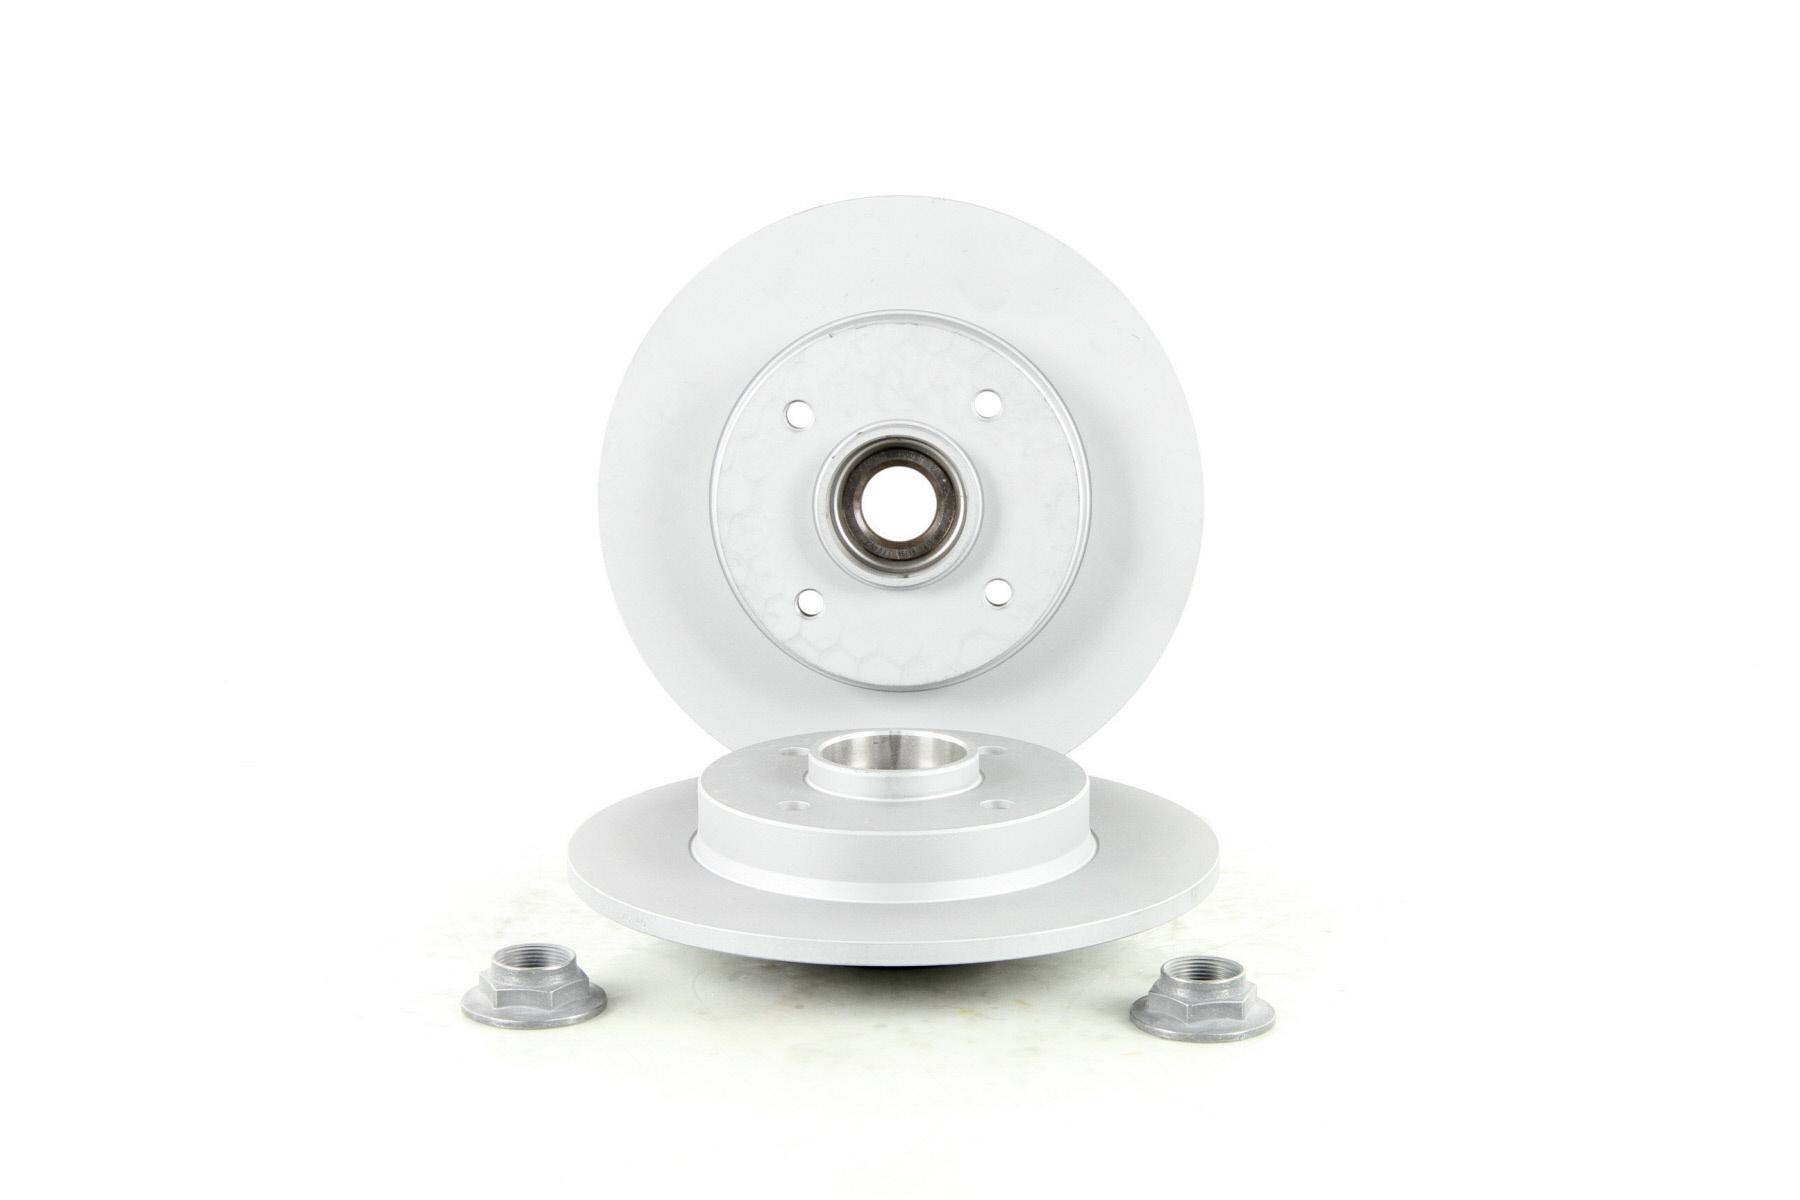 Jeu de 2 disques de frein SNR KF159.61U